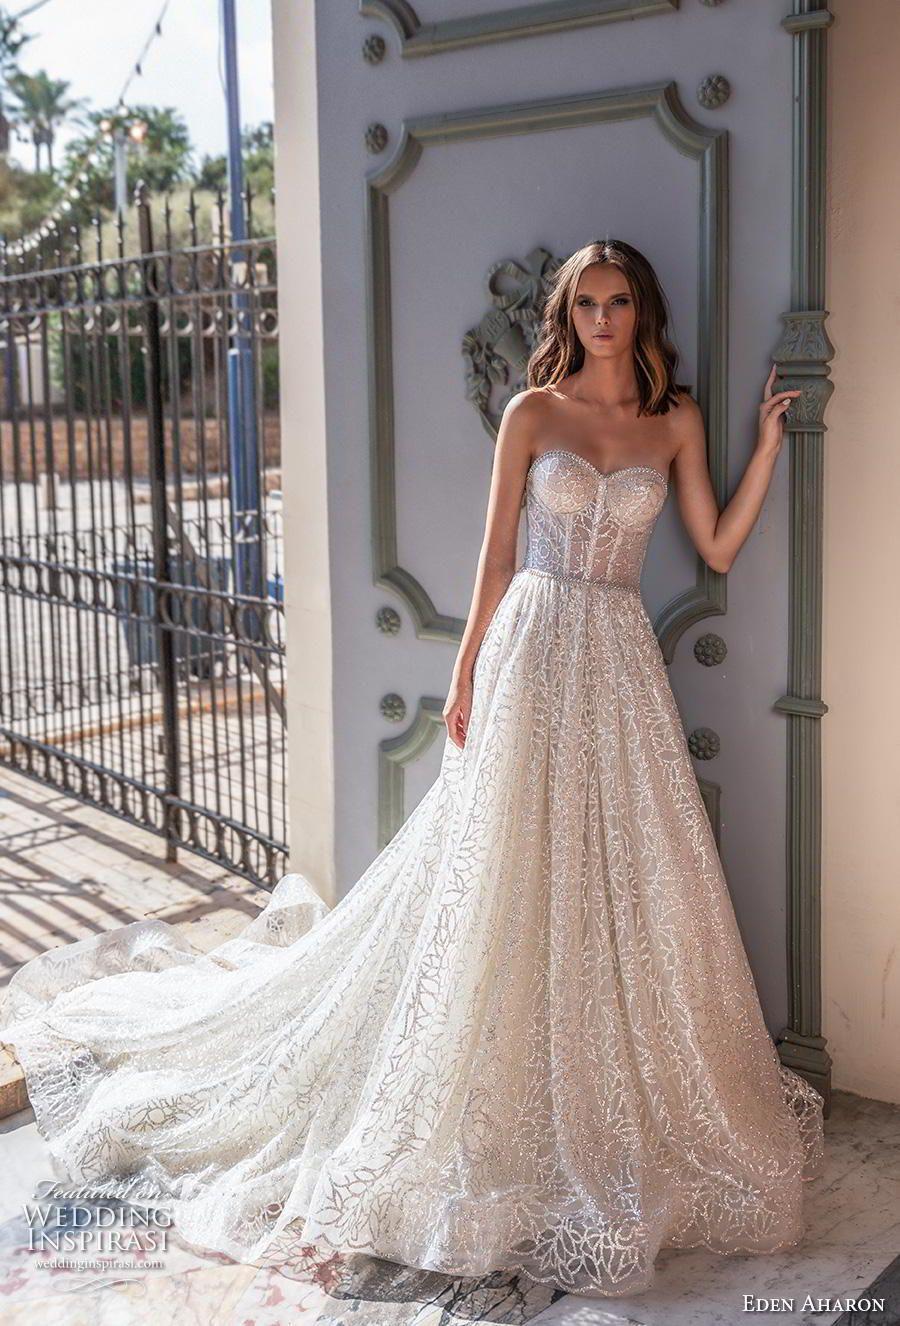 Design your own wedding dress cheap  Eden Aharon  Wedding Dresses u ucBroadwayud Bridal Collection in